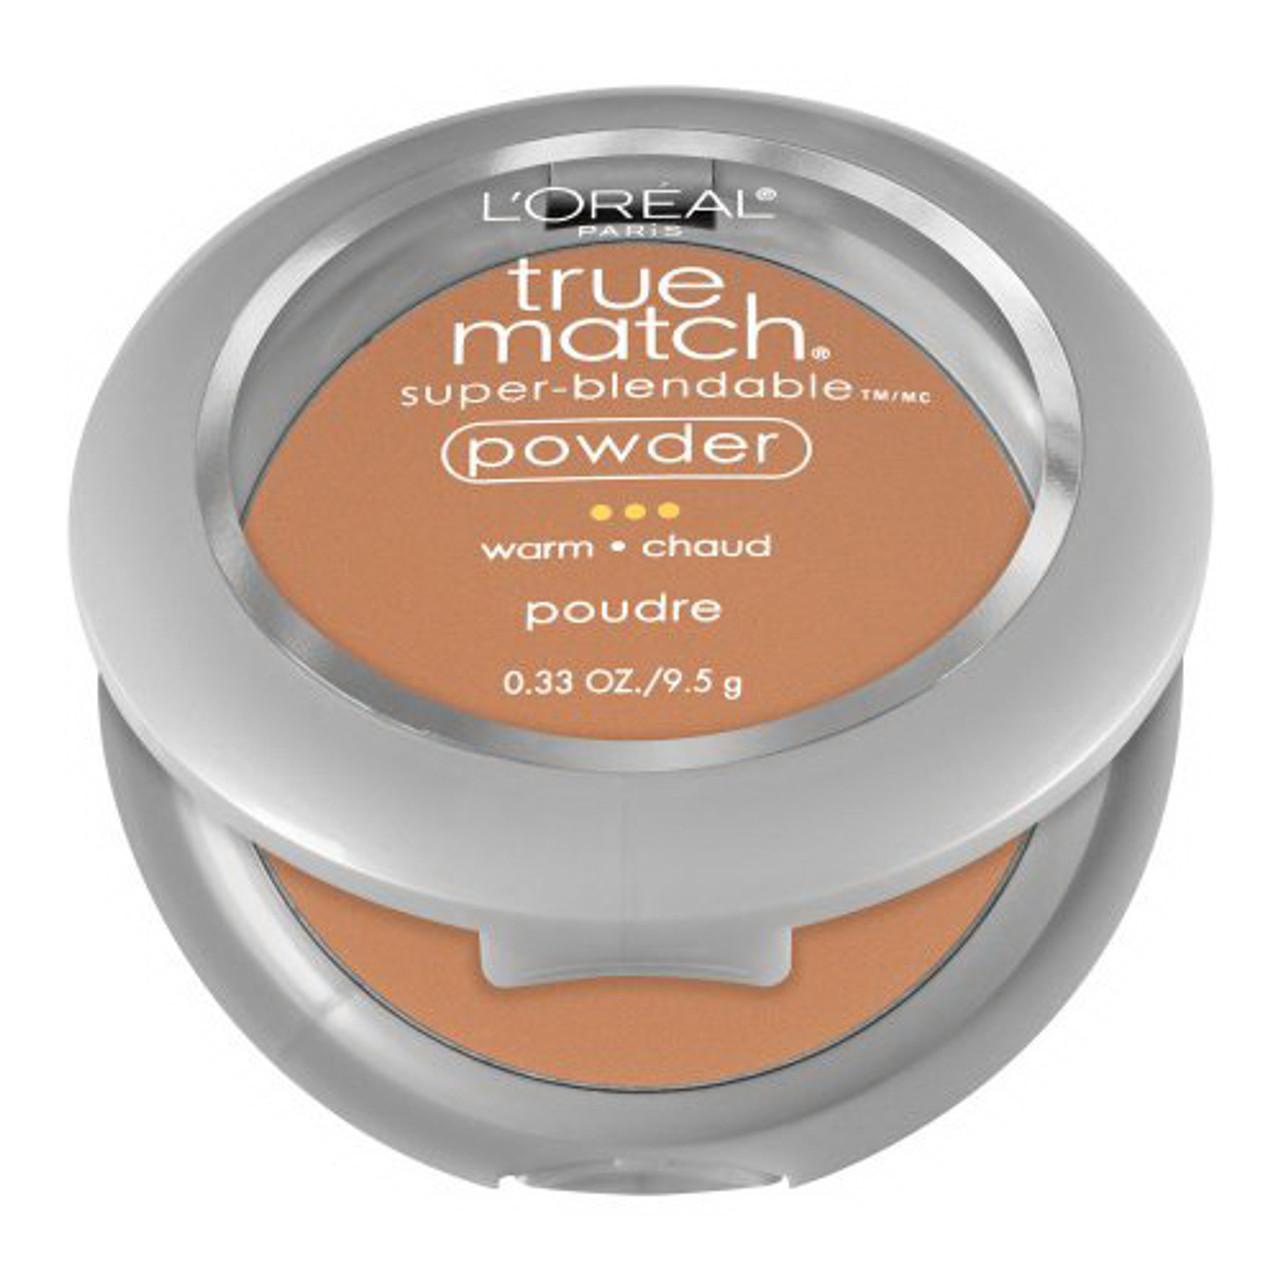 Loreal True Match Super Blendable Pressed Powder, Warm